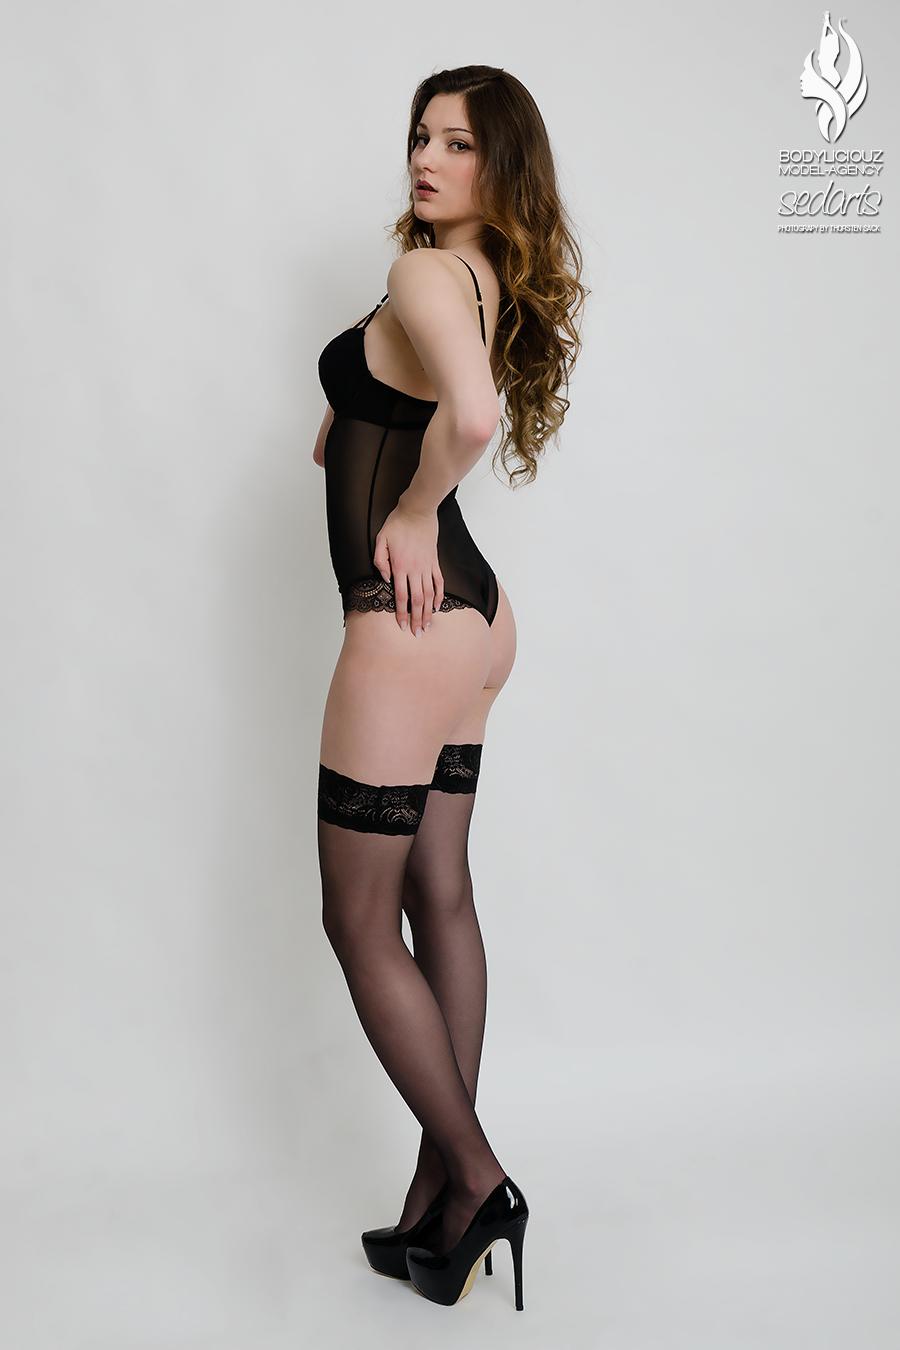 Nadina Nahmer